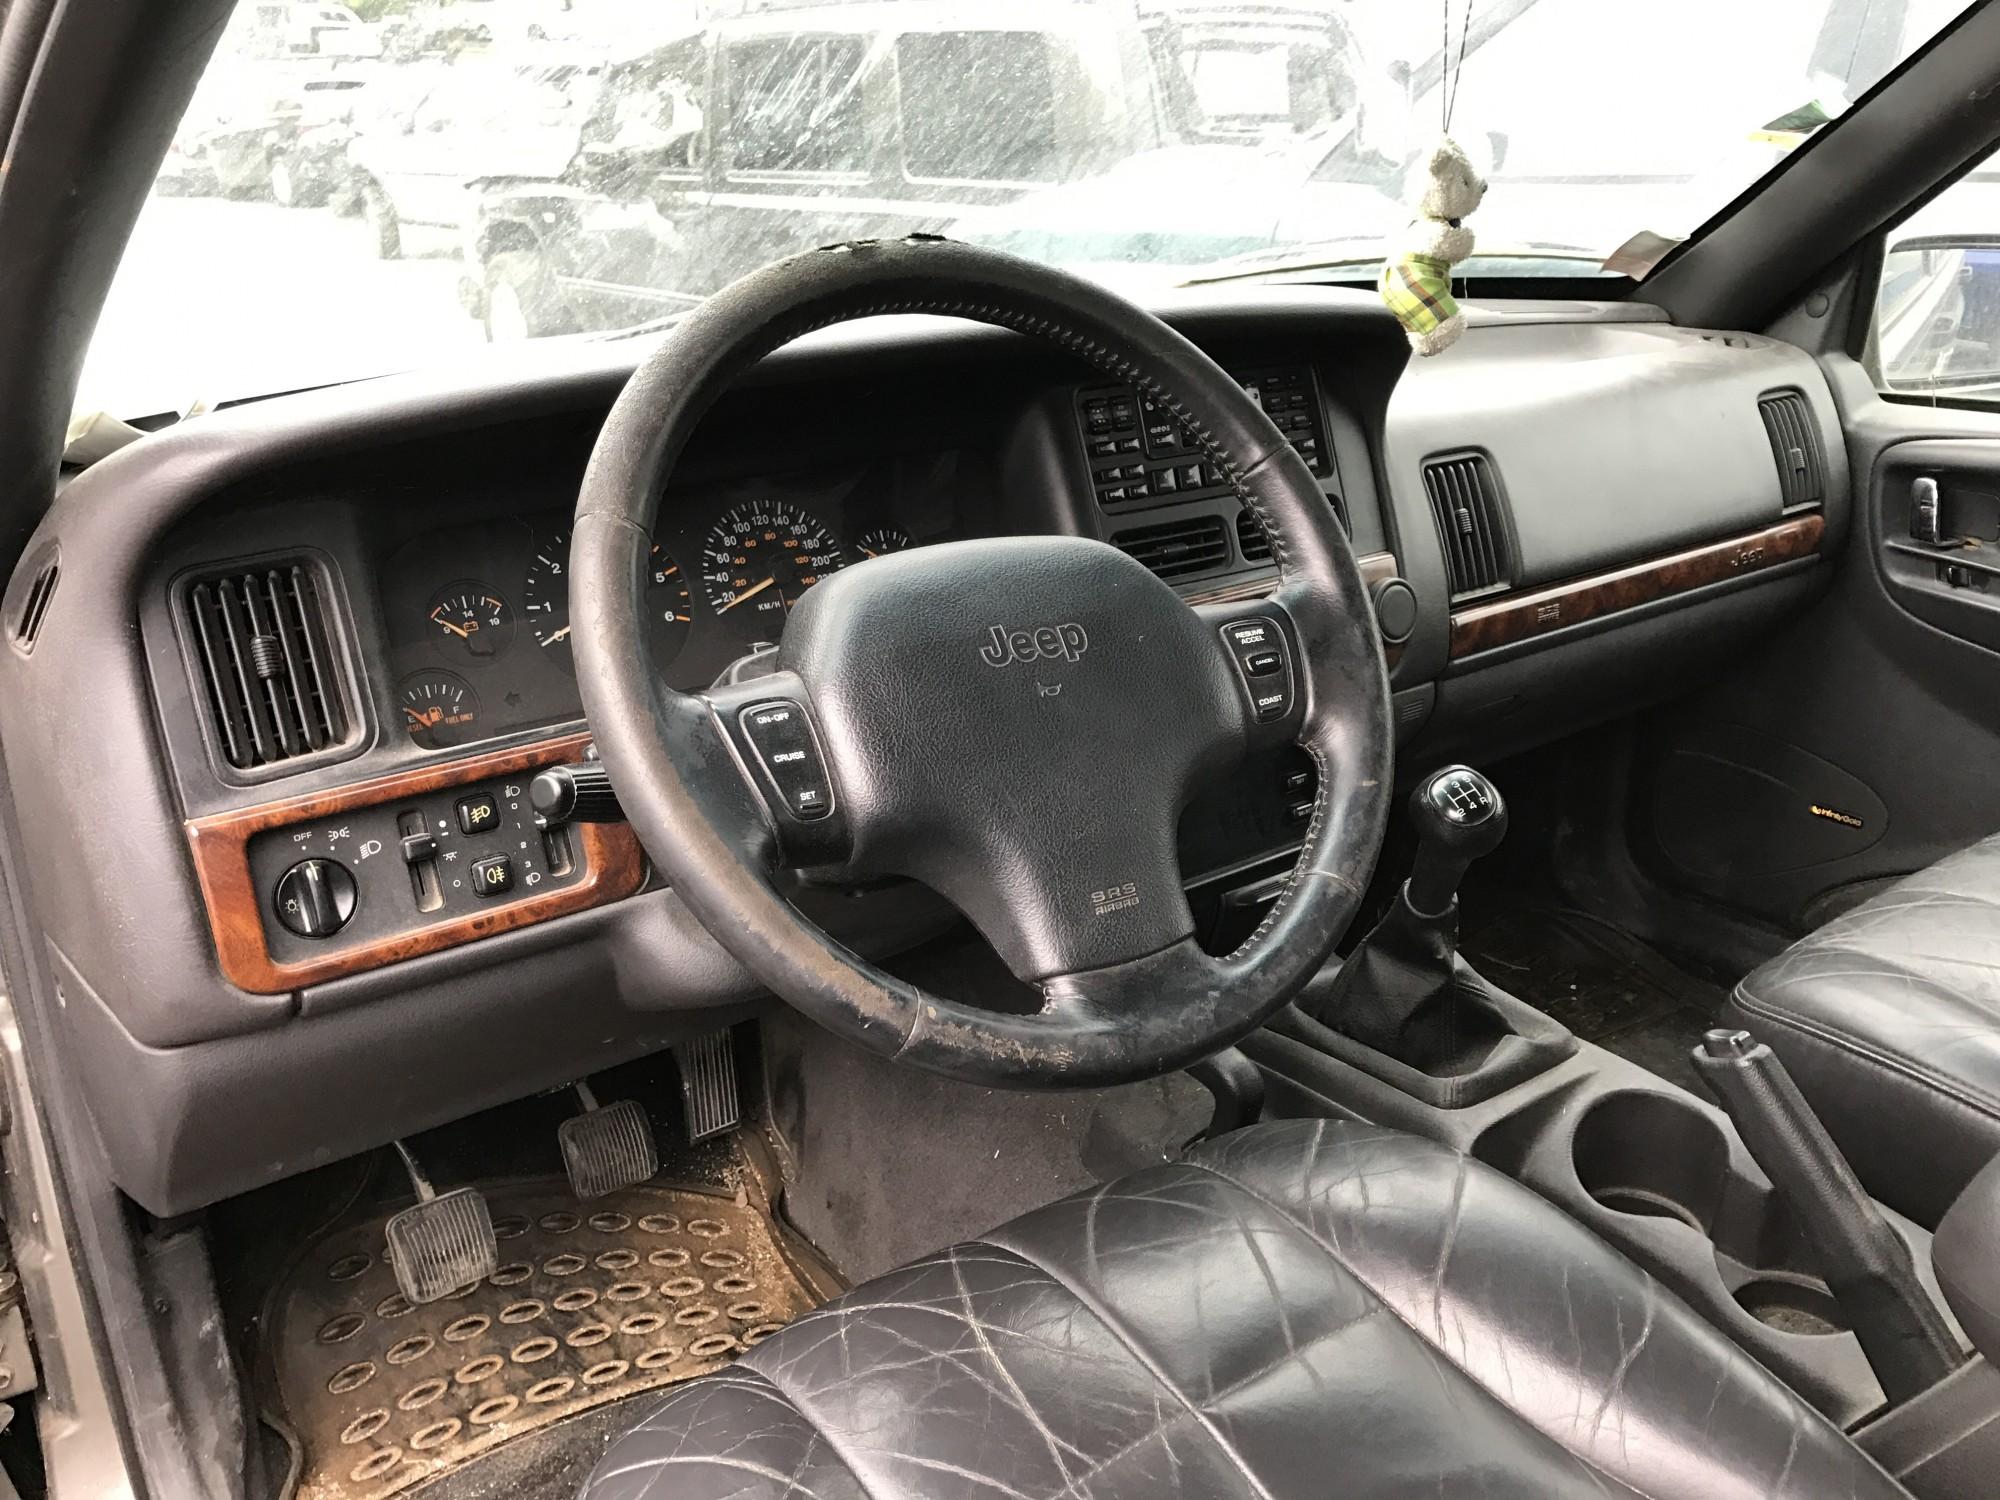 pi ces d tach es pour jeep grand cherokee 2 5 td 115 ch limited de 1997 4x4 occasion pro fun 4x4. Black Bedroom Furniture Sets. Home Design Ideas